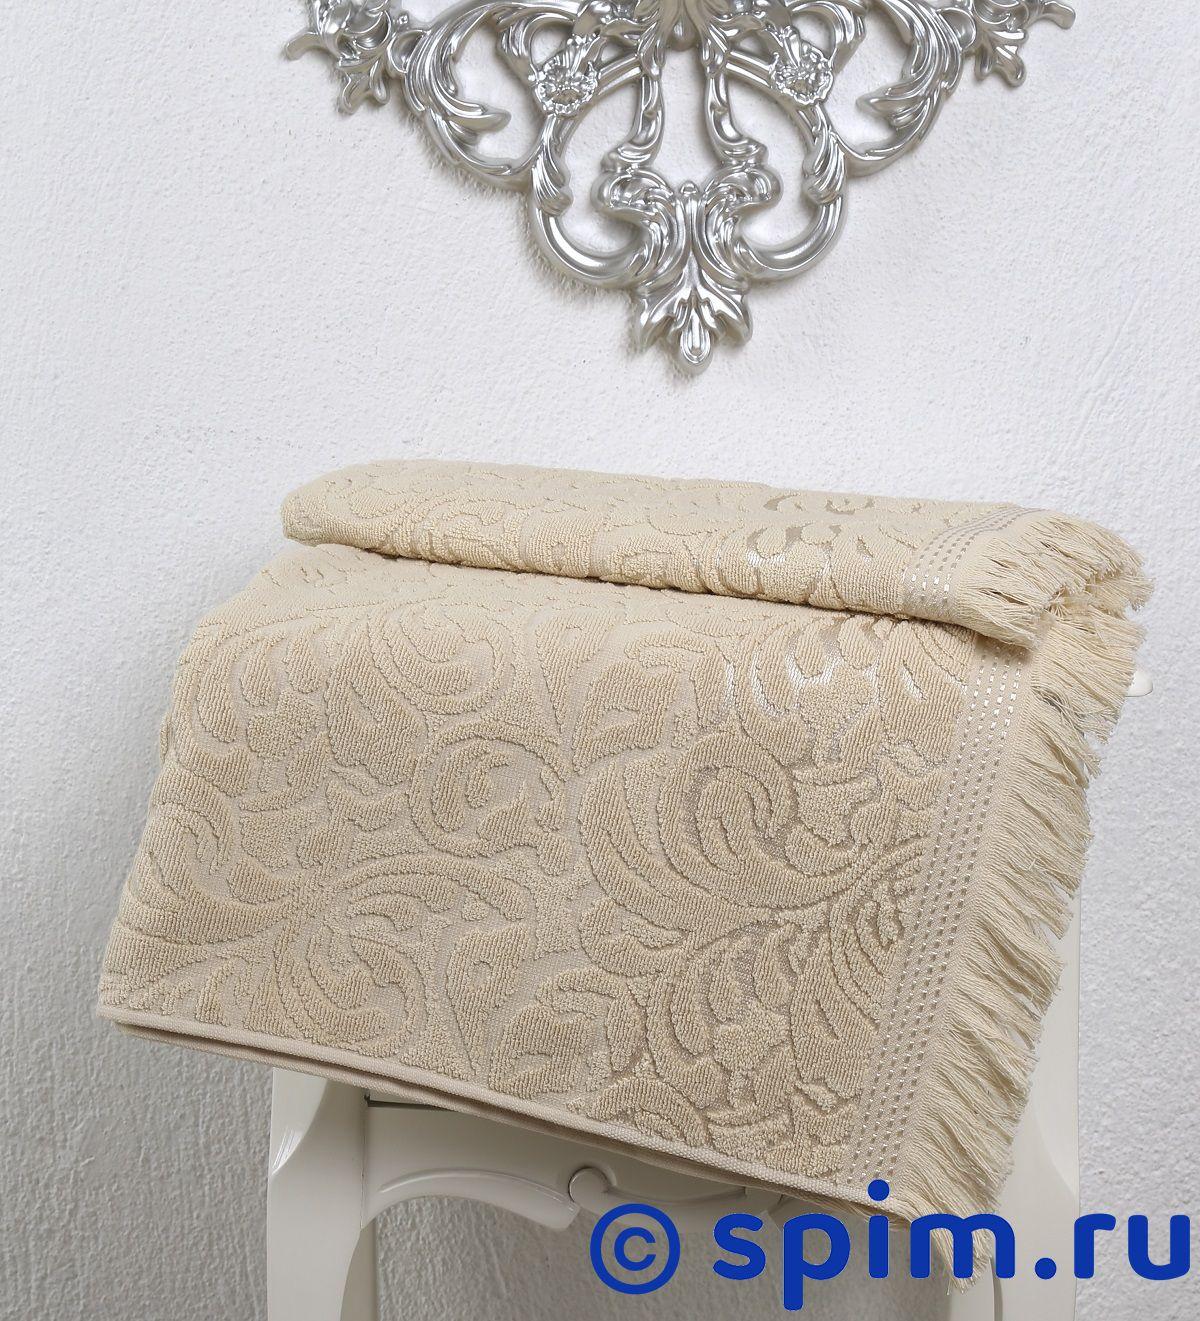 Полотенце Karna Esra 70х140 см, бежевое комплект махровых полотенец karna esra 50x90 70х140 см 1158865